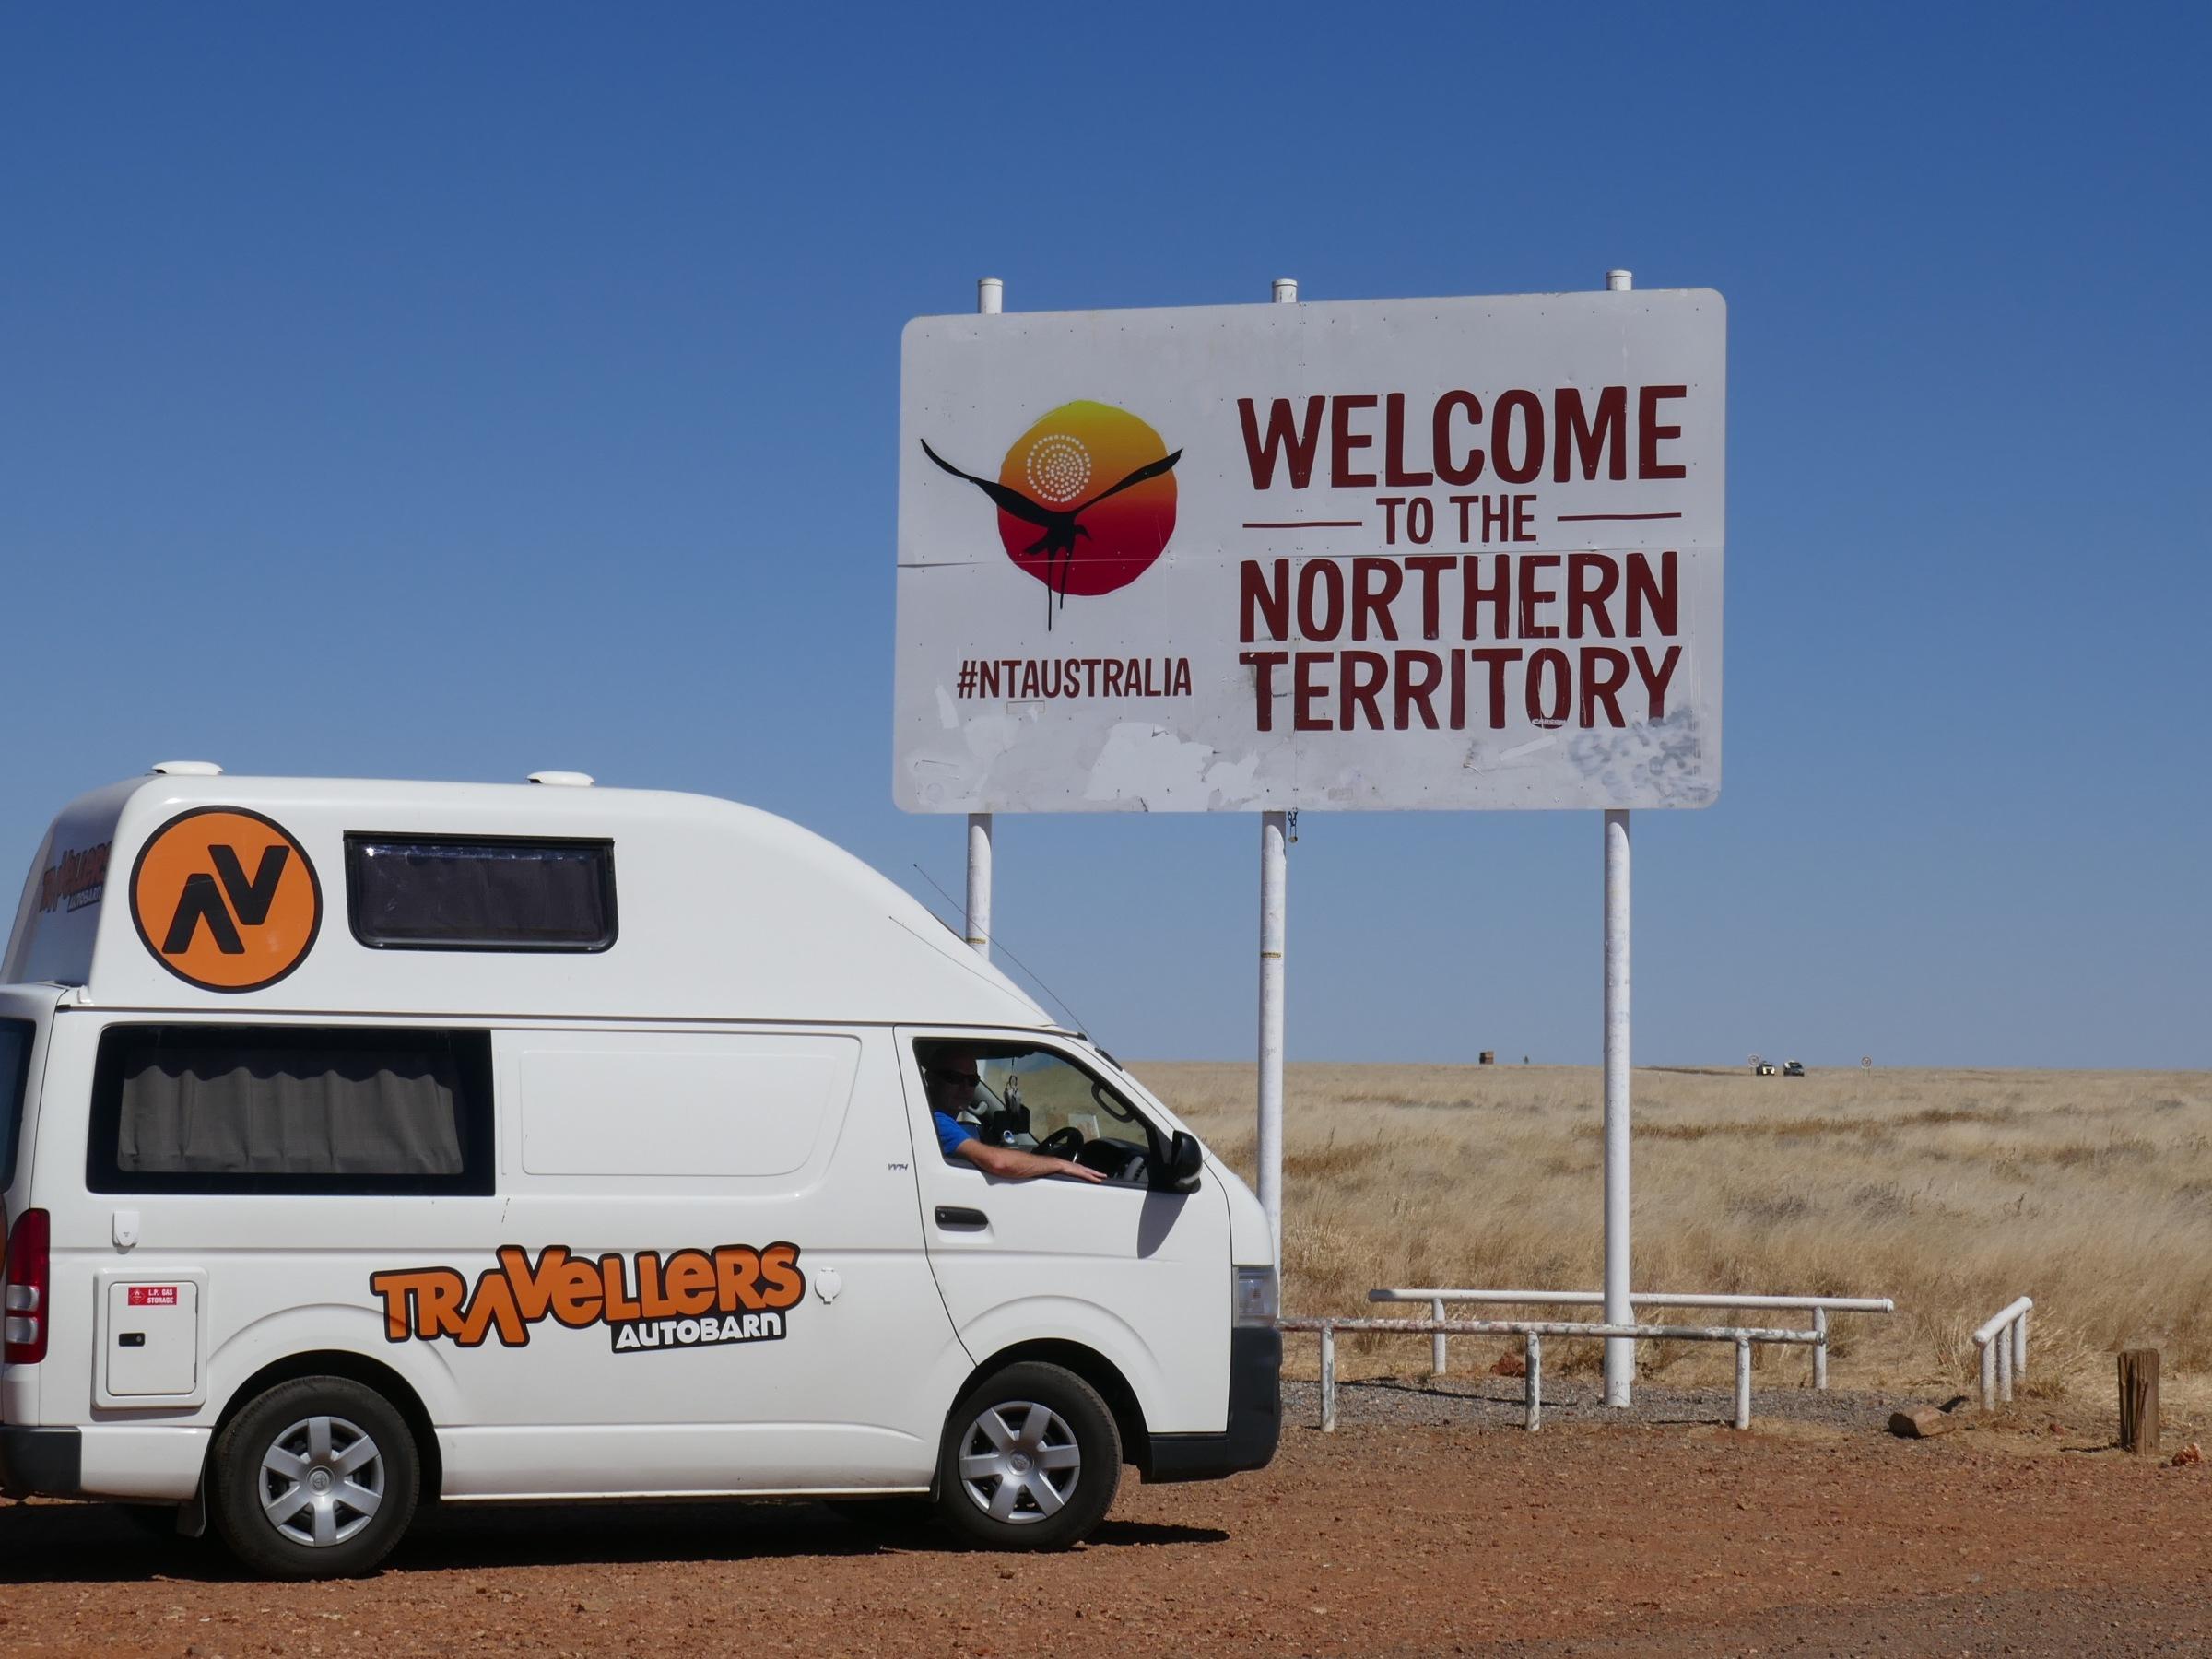 Travellers Autobarn Kuga Rental